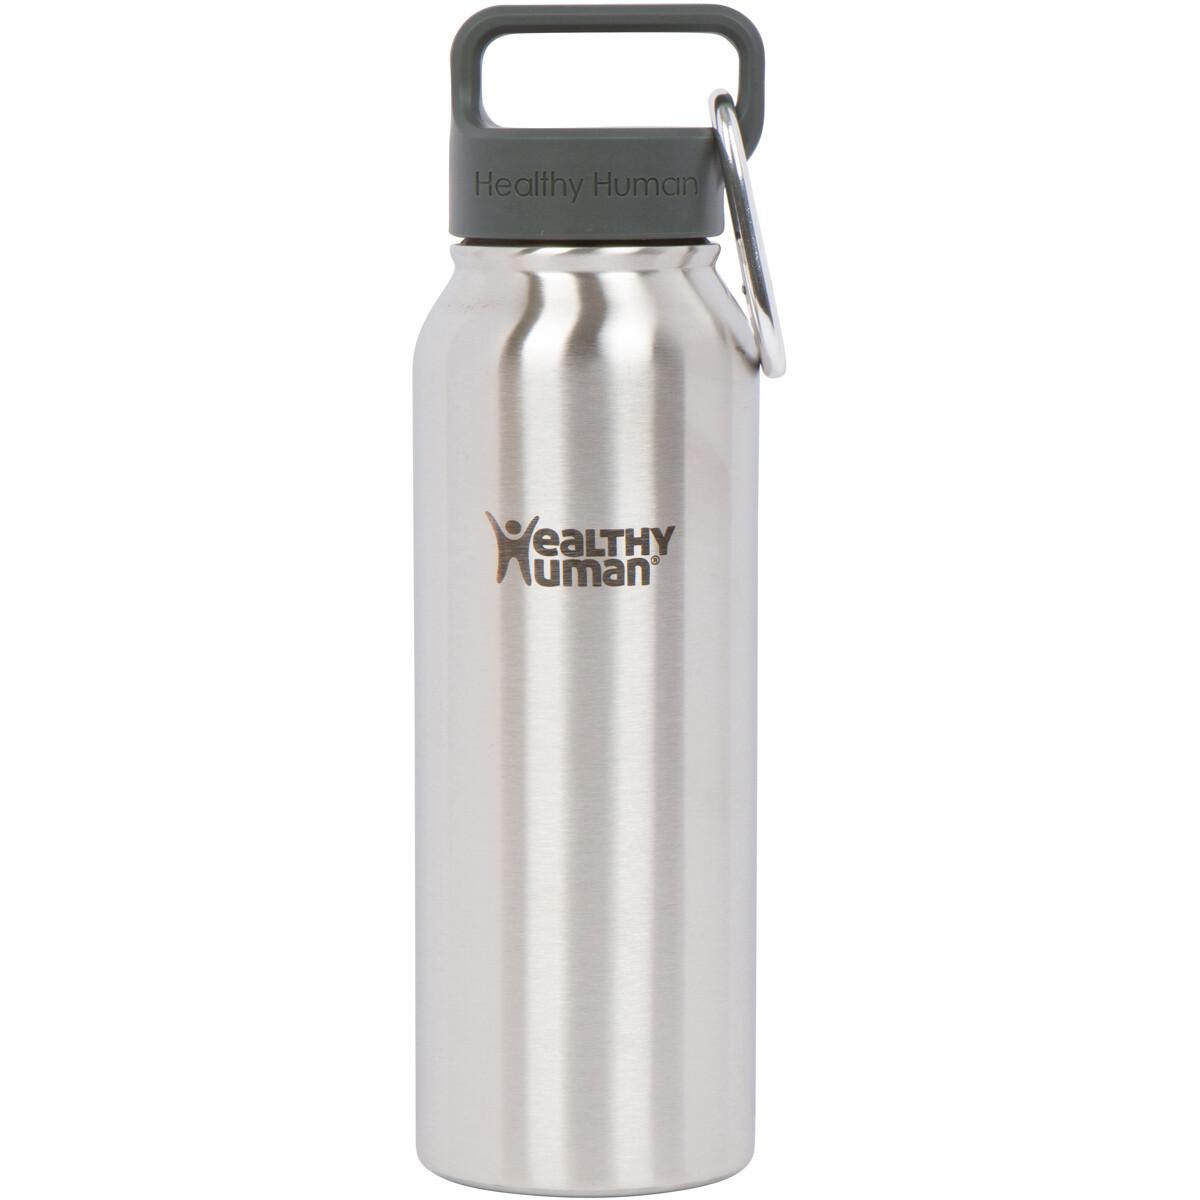 Healthy Human- Stein Bottle Brushed Steel 621ml